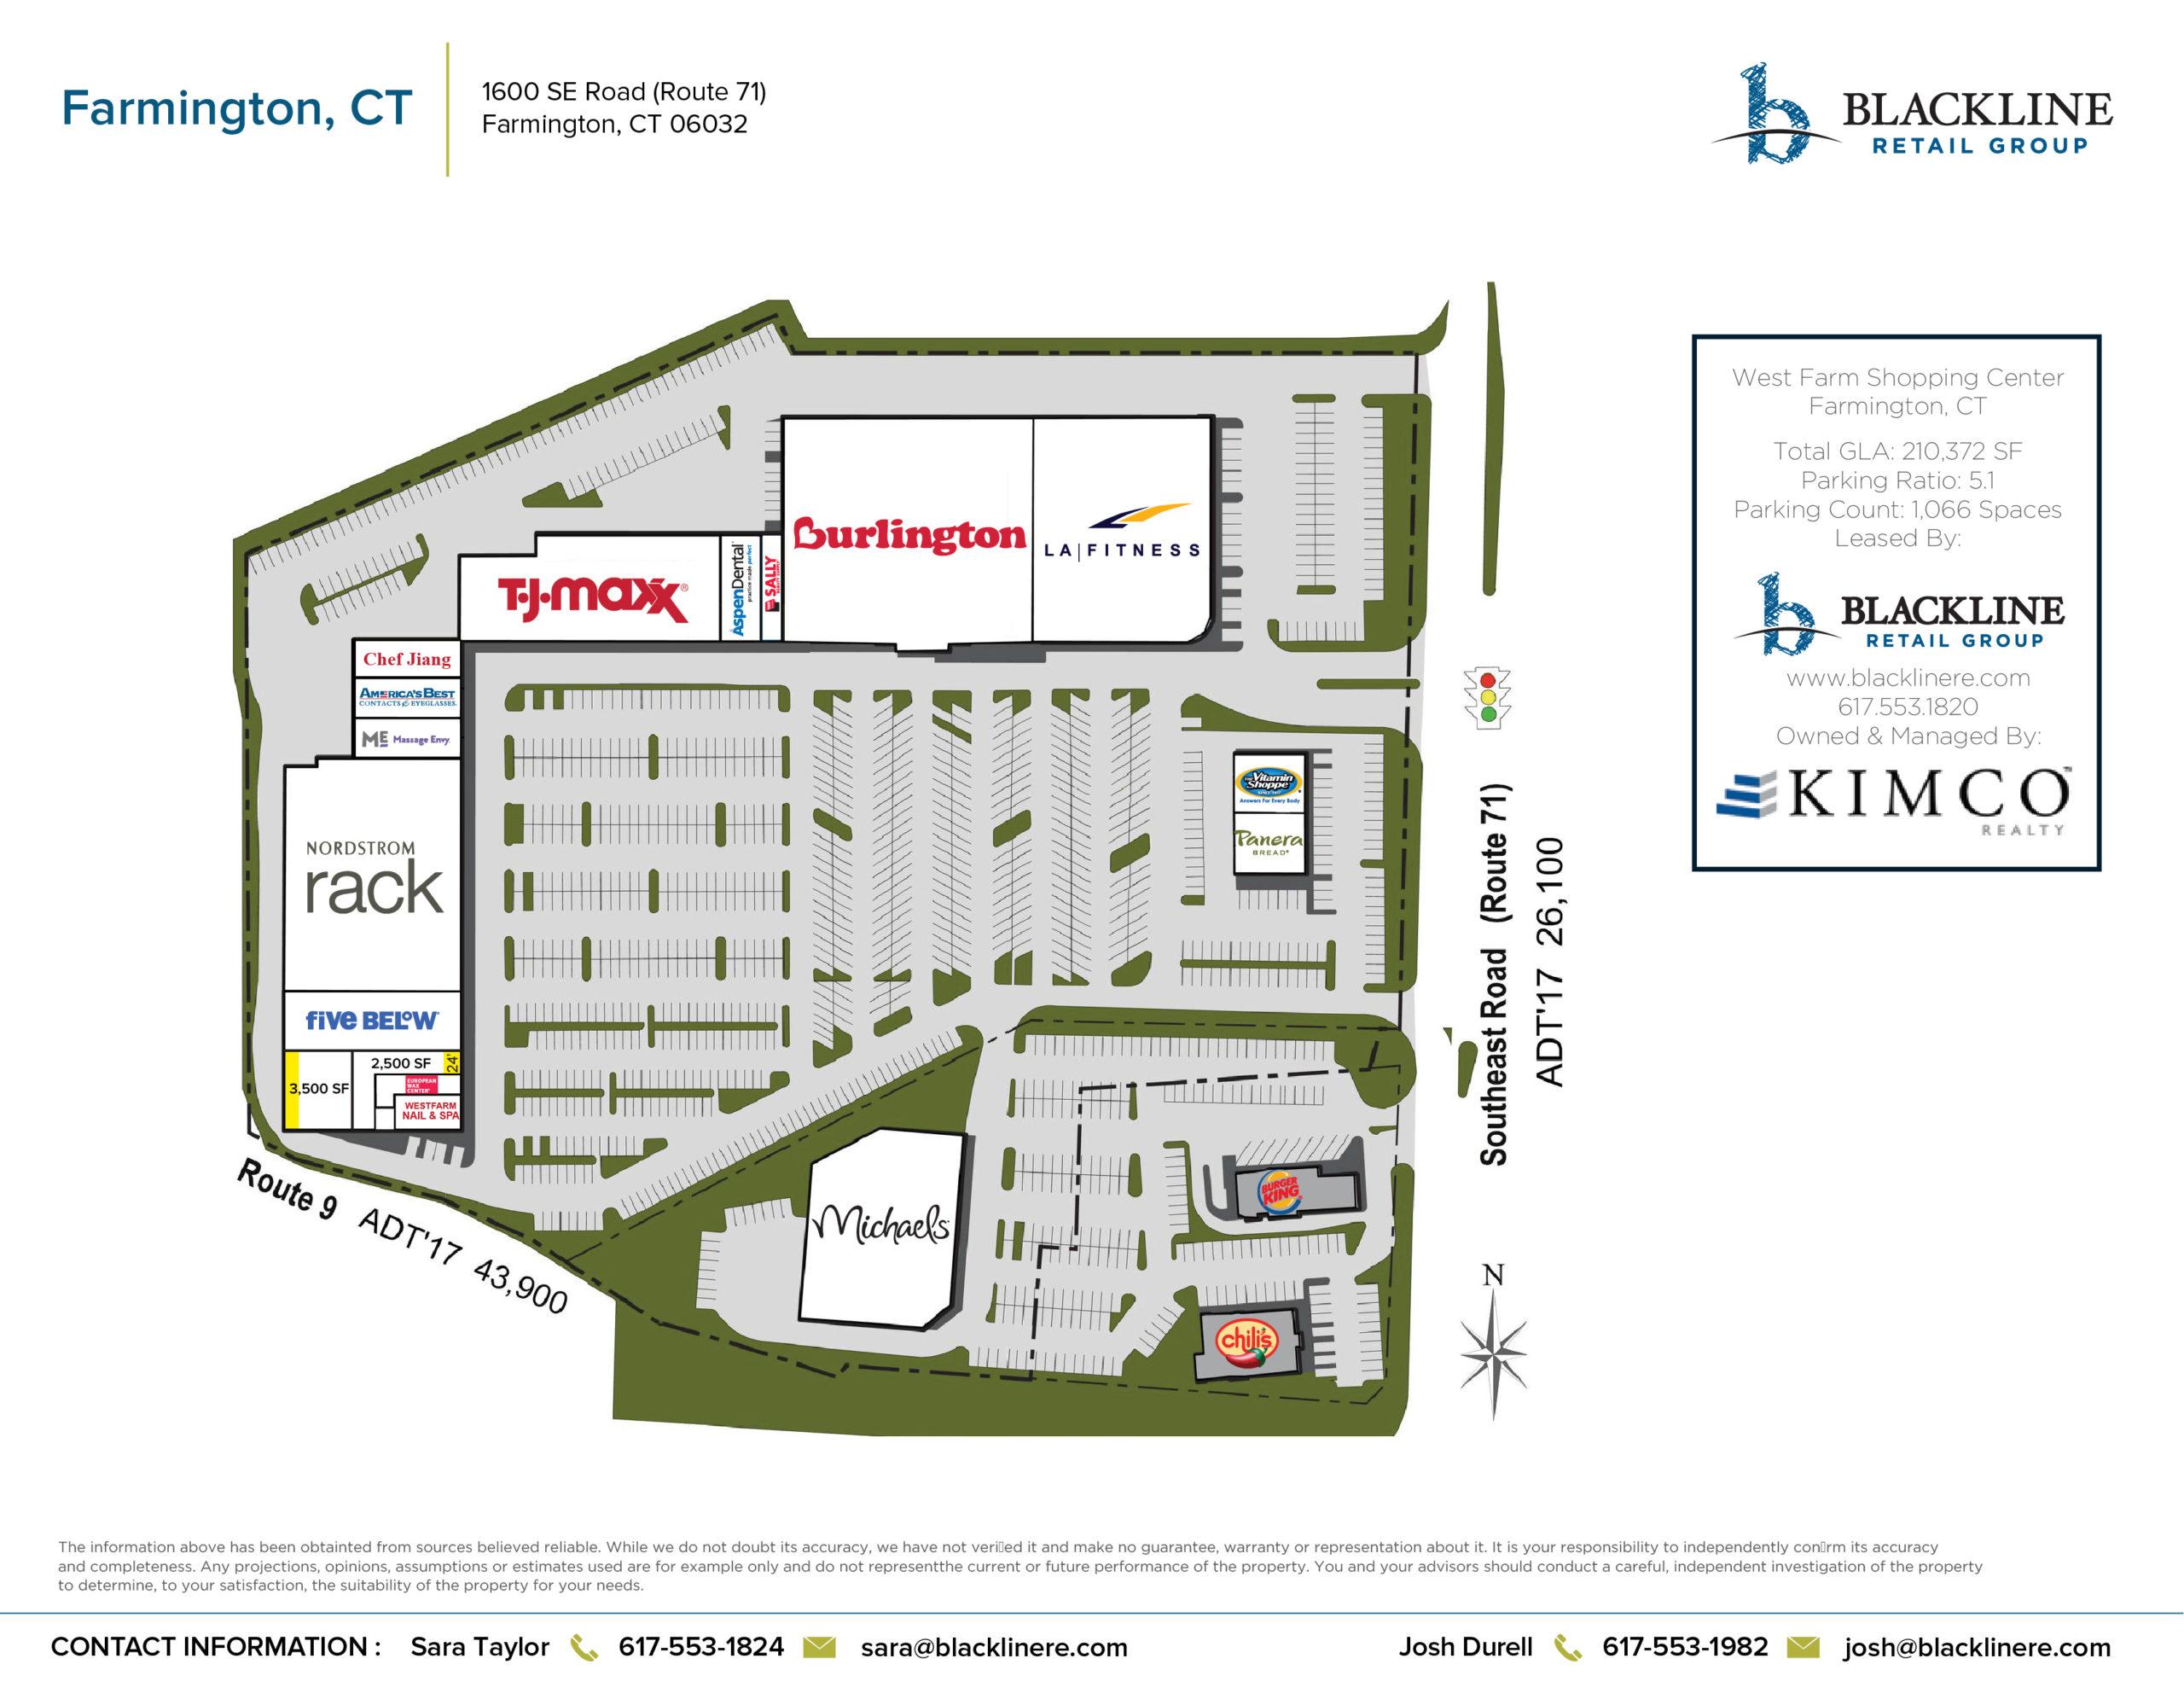 Farmington, Ct West Farm Shopping Center